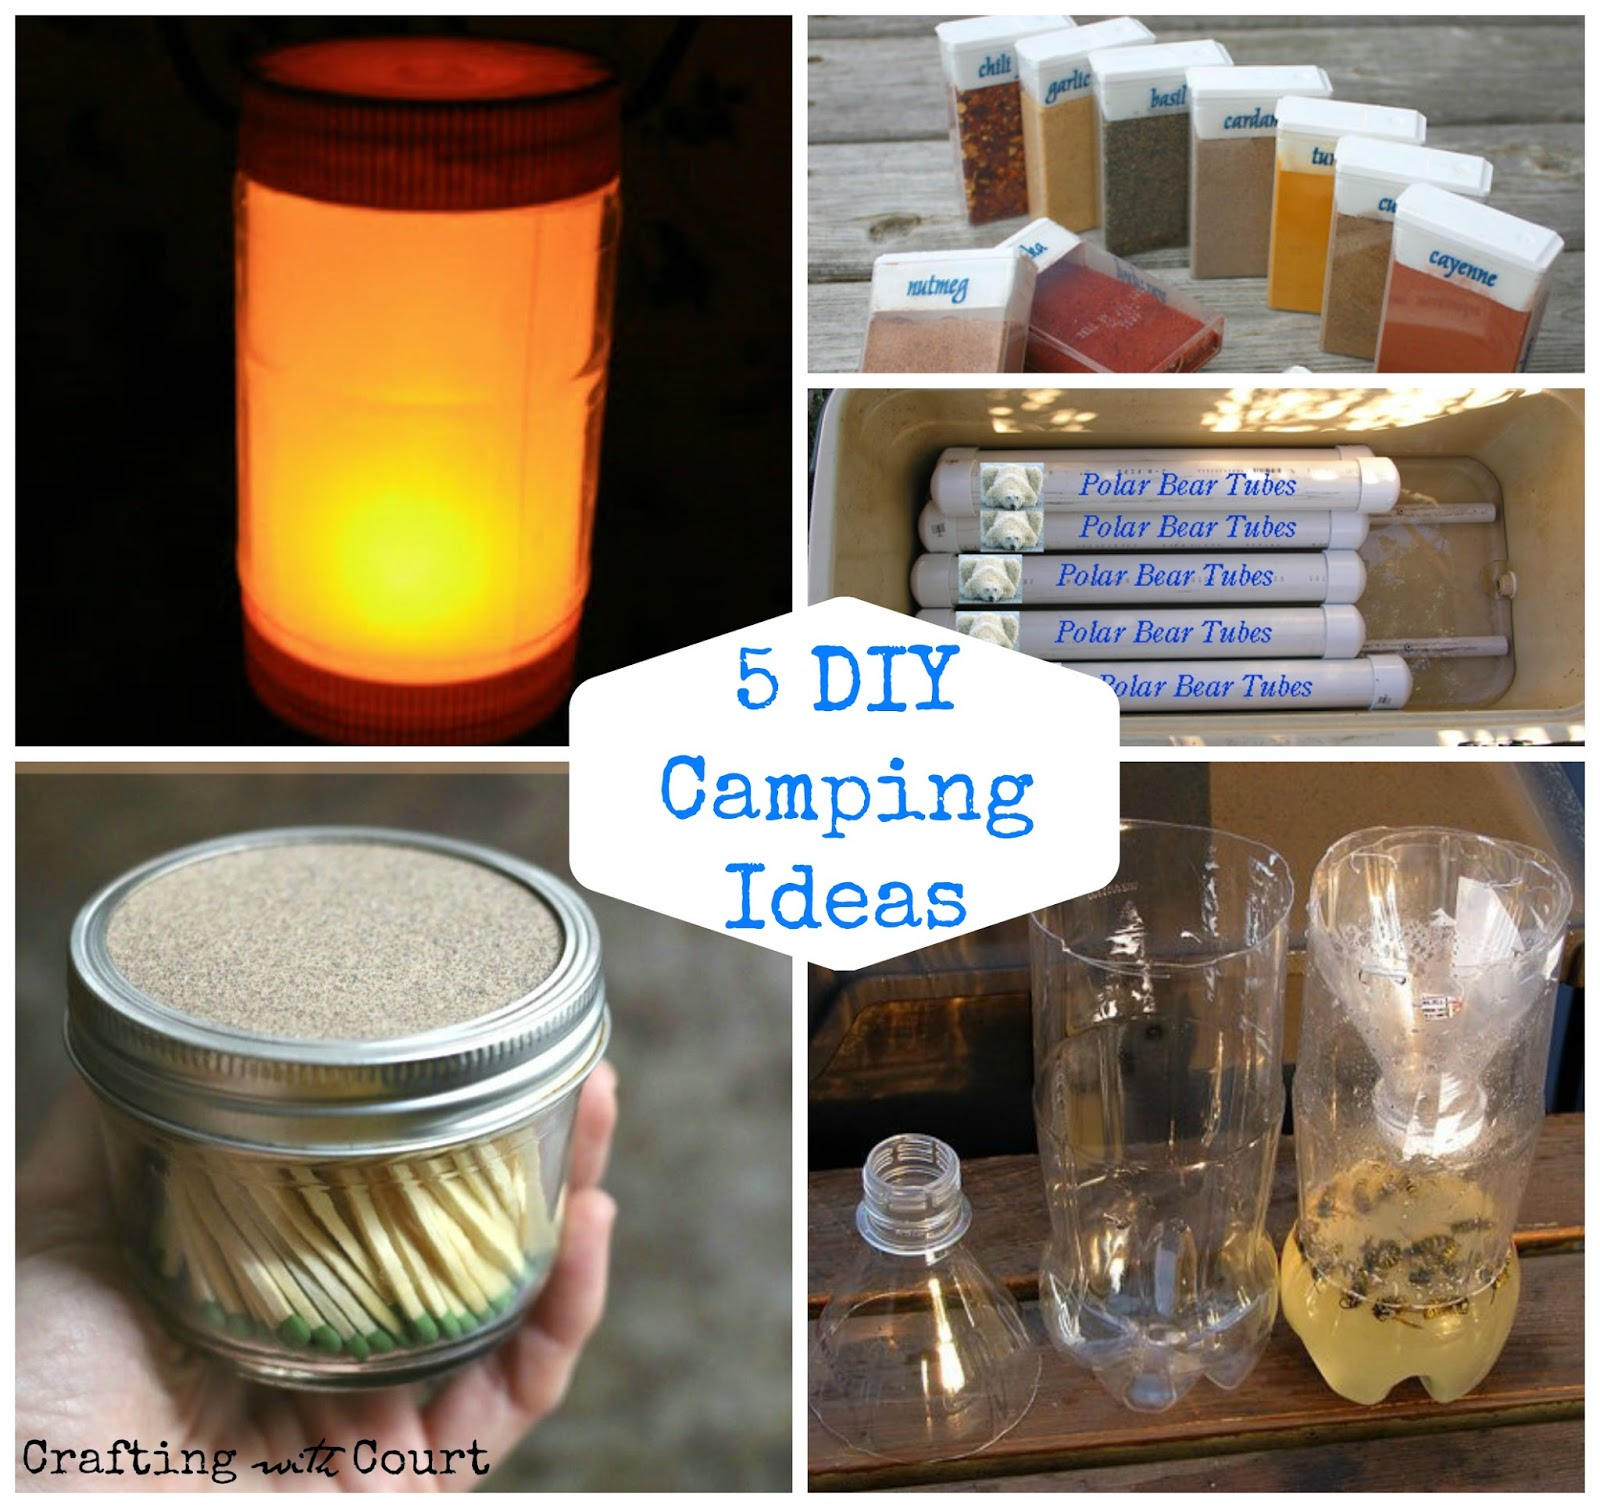 5 DIY Camping Ideas